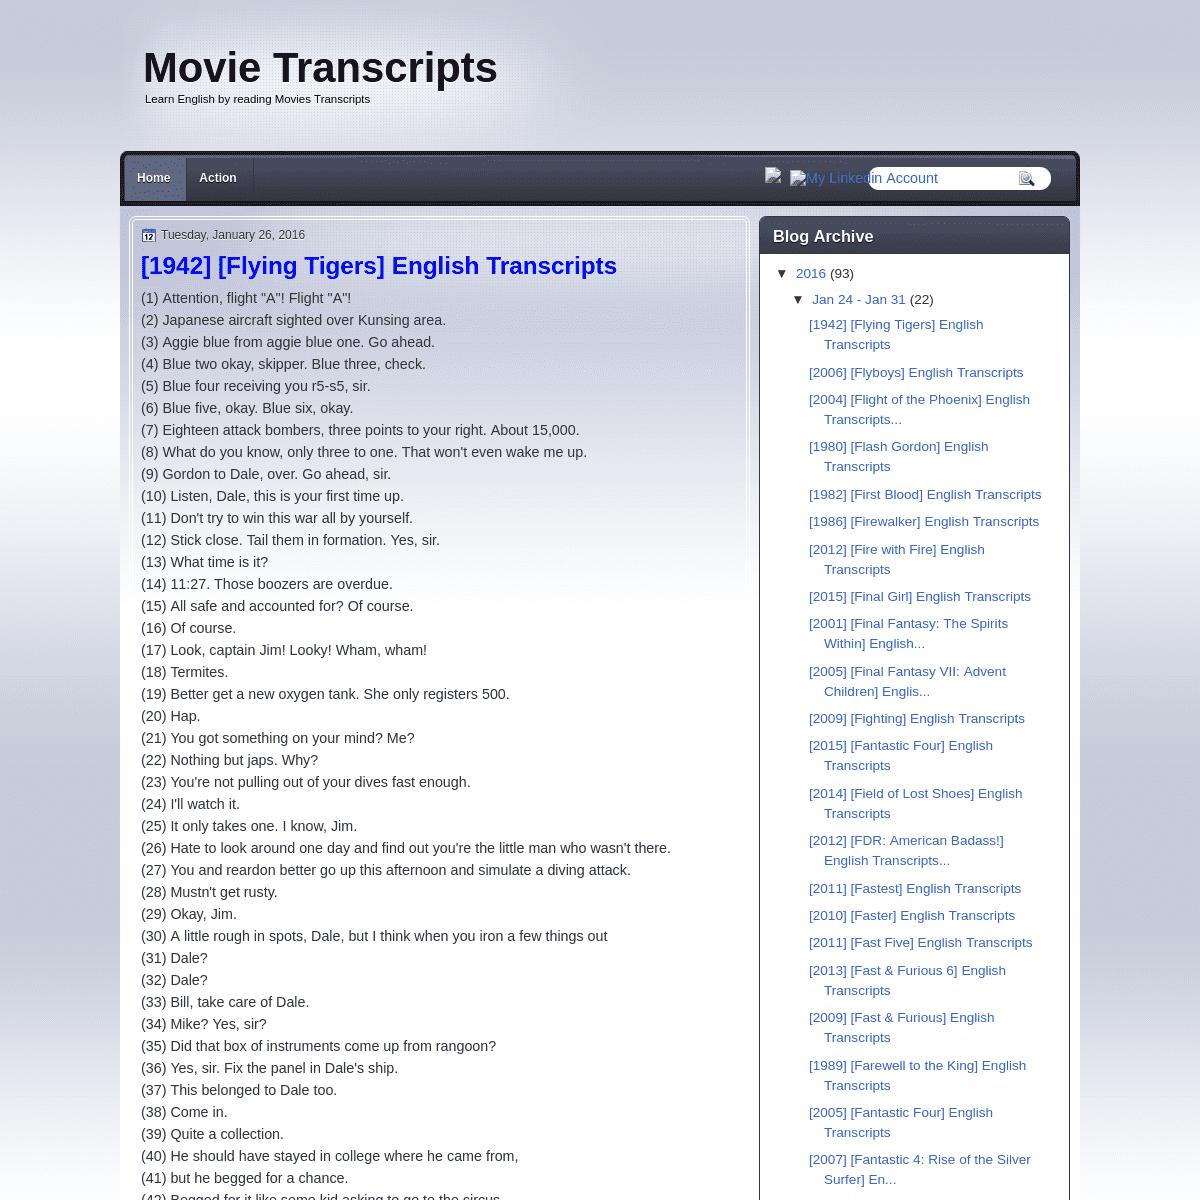 Movie Transcripts